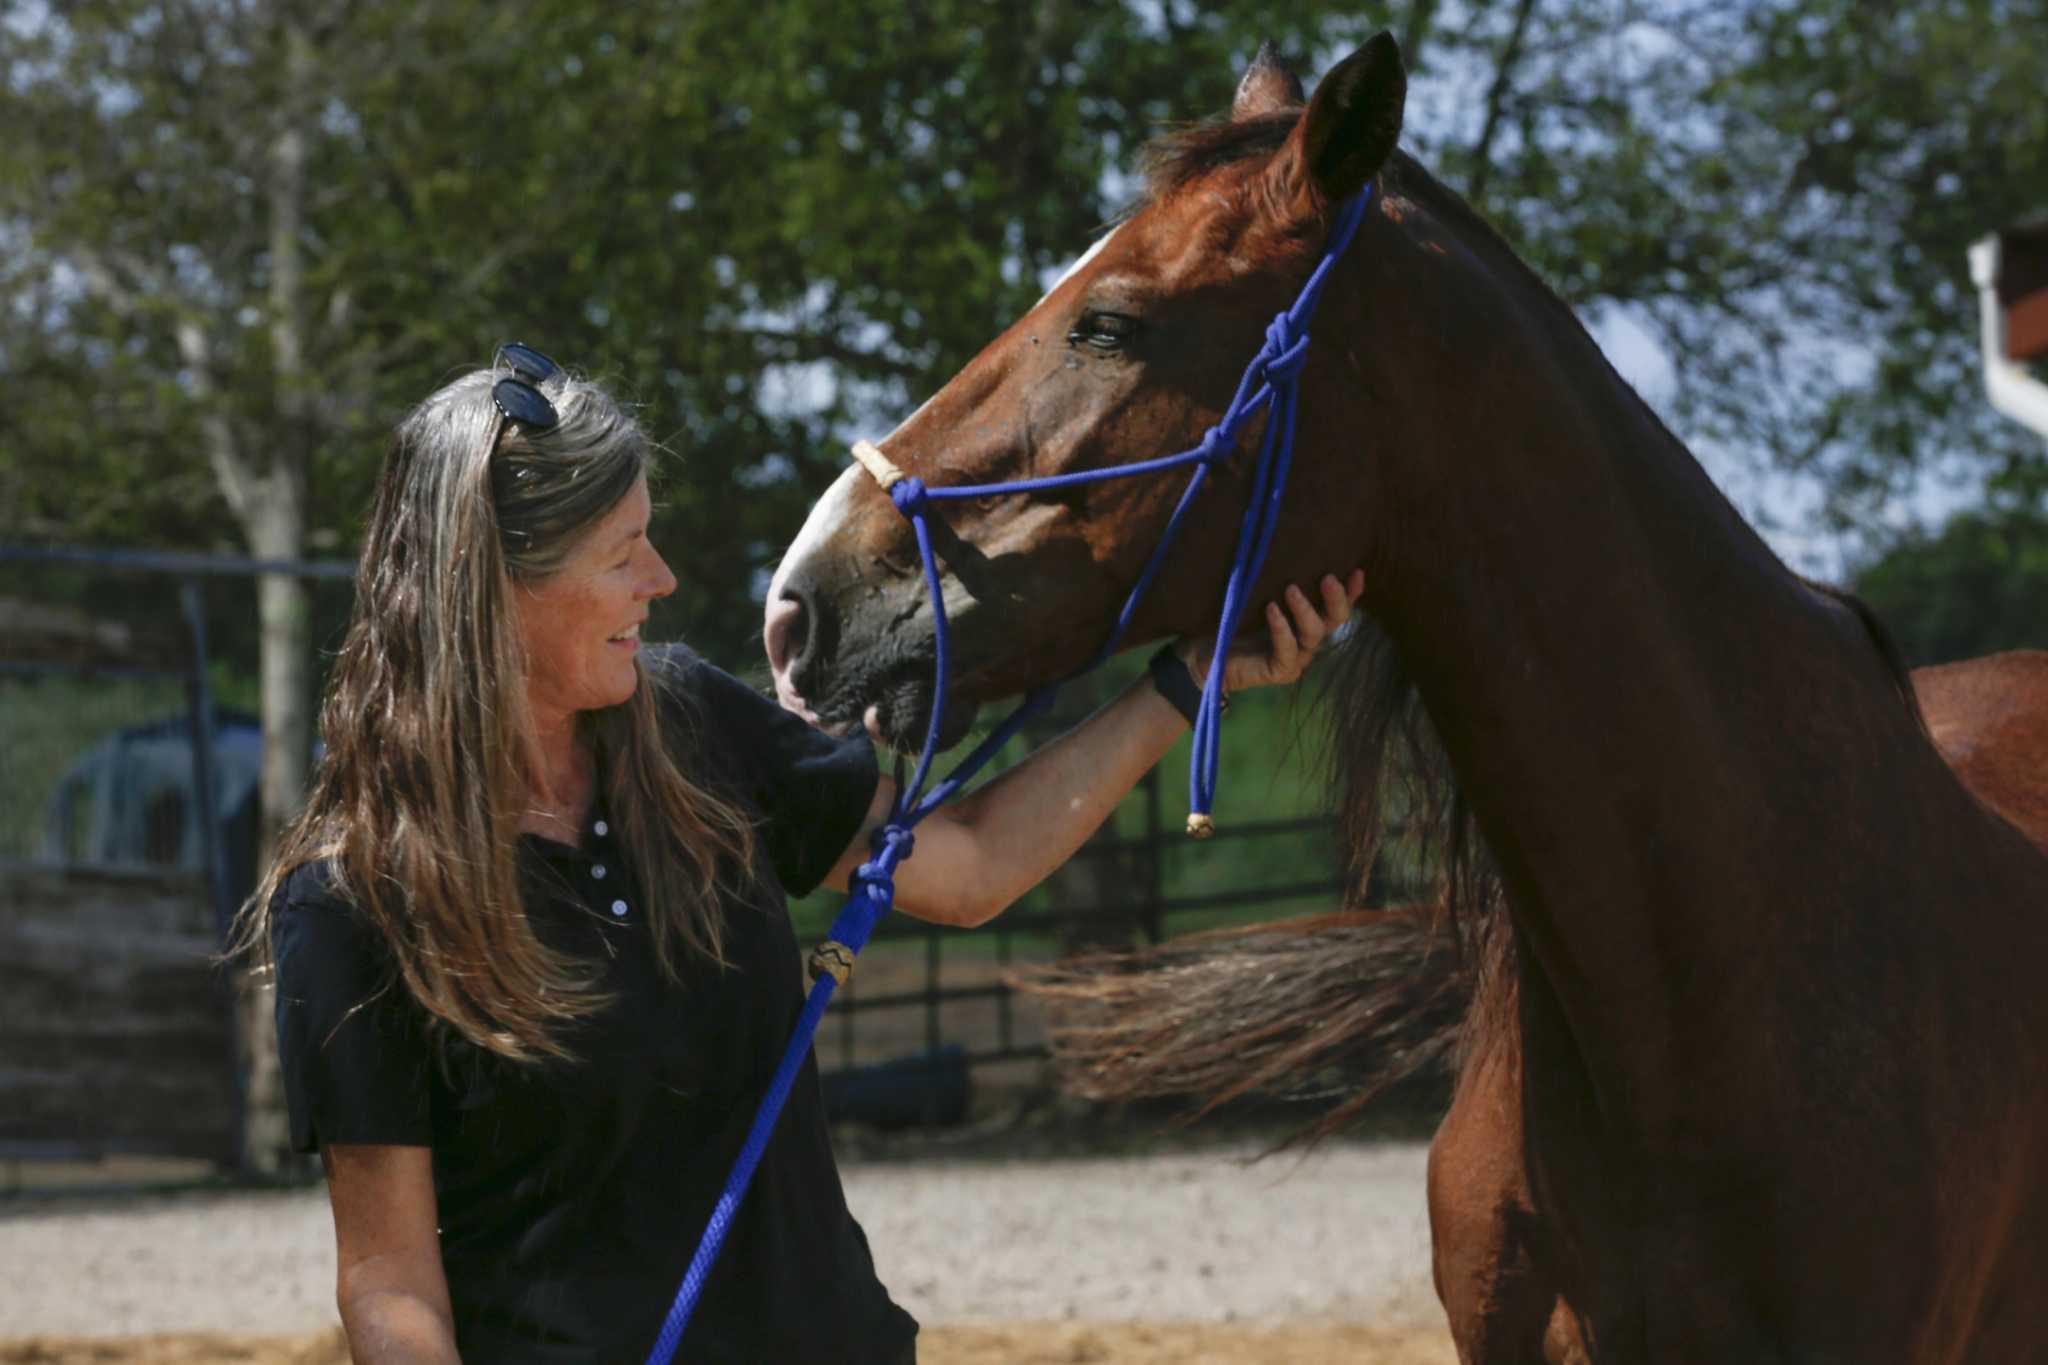 Rebecca Williams Advocates For Equine Rescue And Sanctuary Houstonchronicle Com